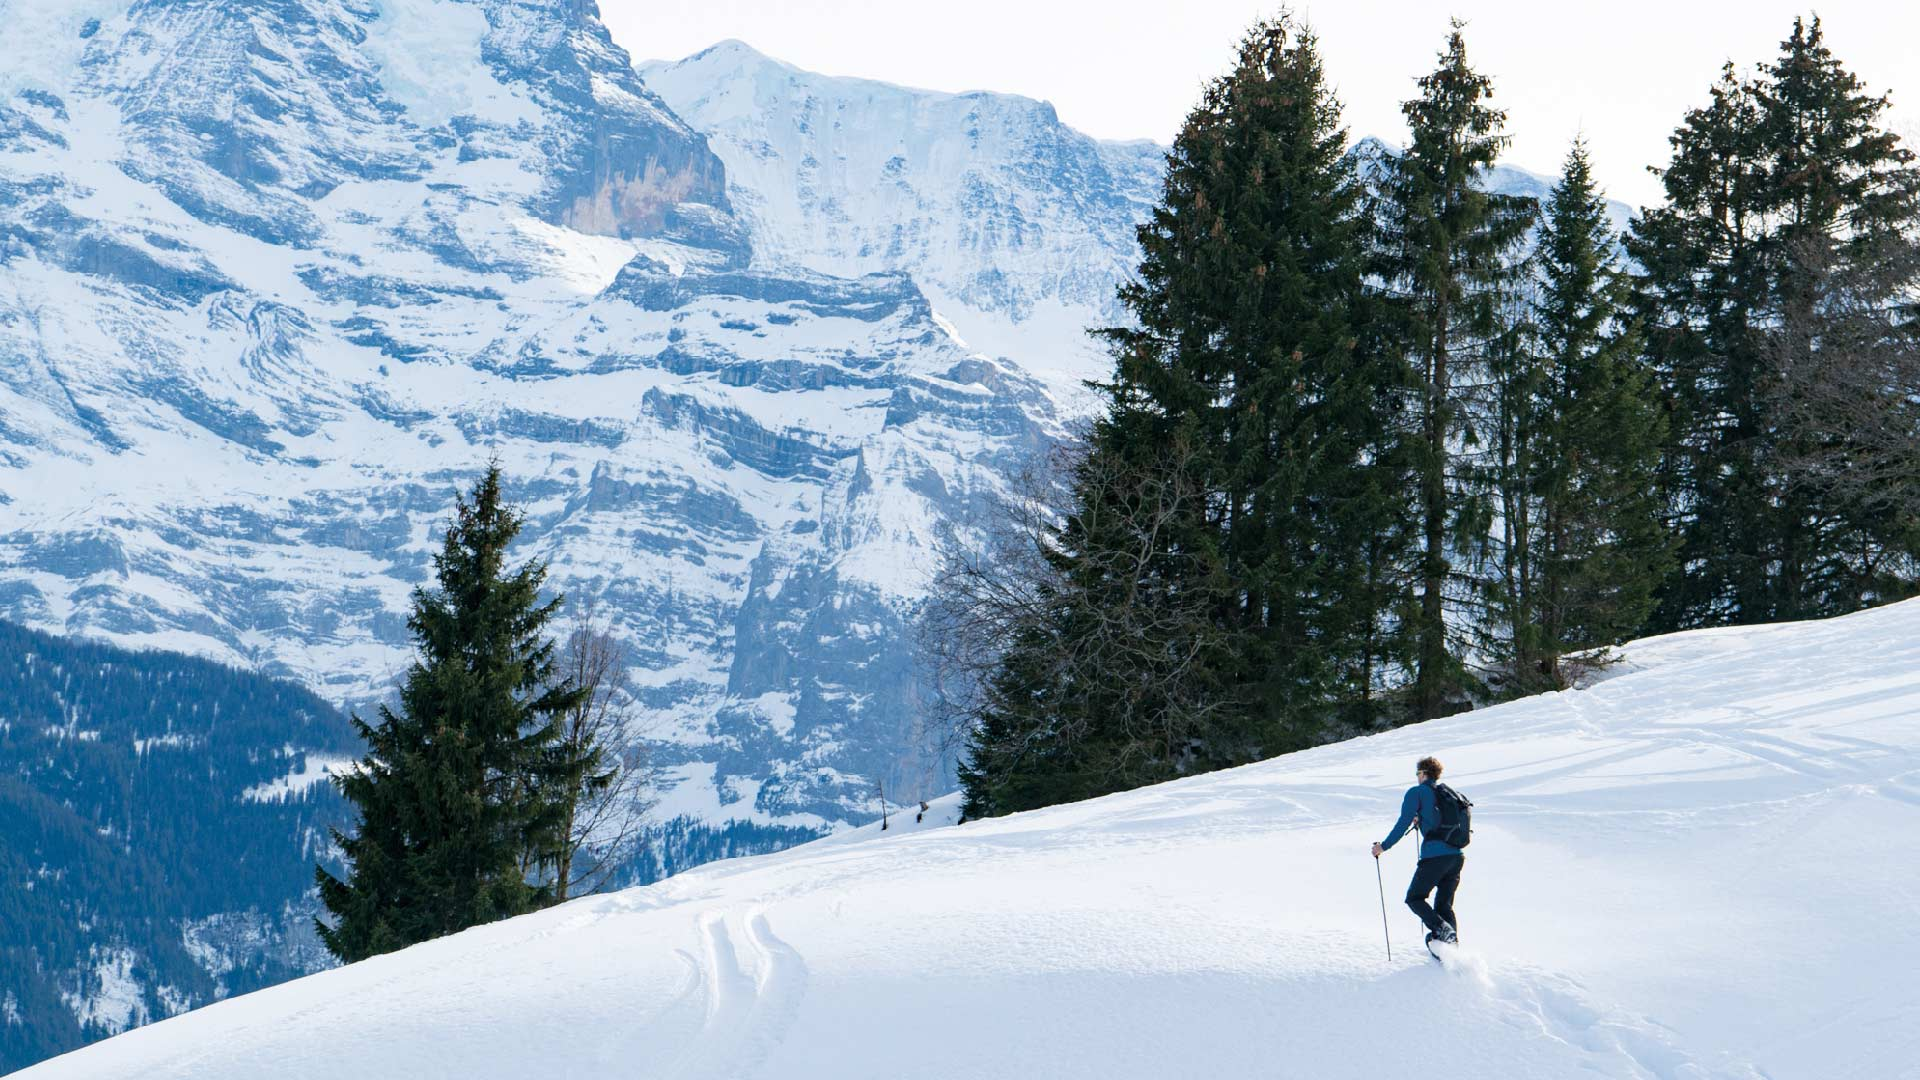 schneeschuh-outdoor-active-schnee-spass-natur-winter-schneeschuhlaeufer